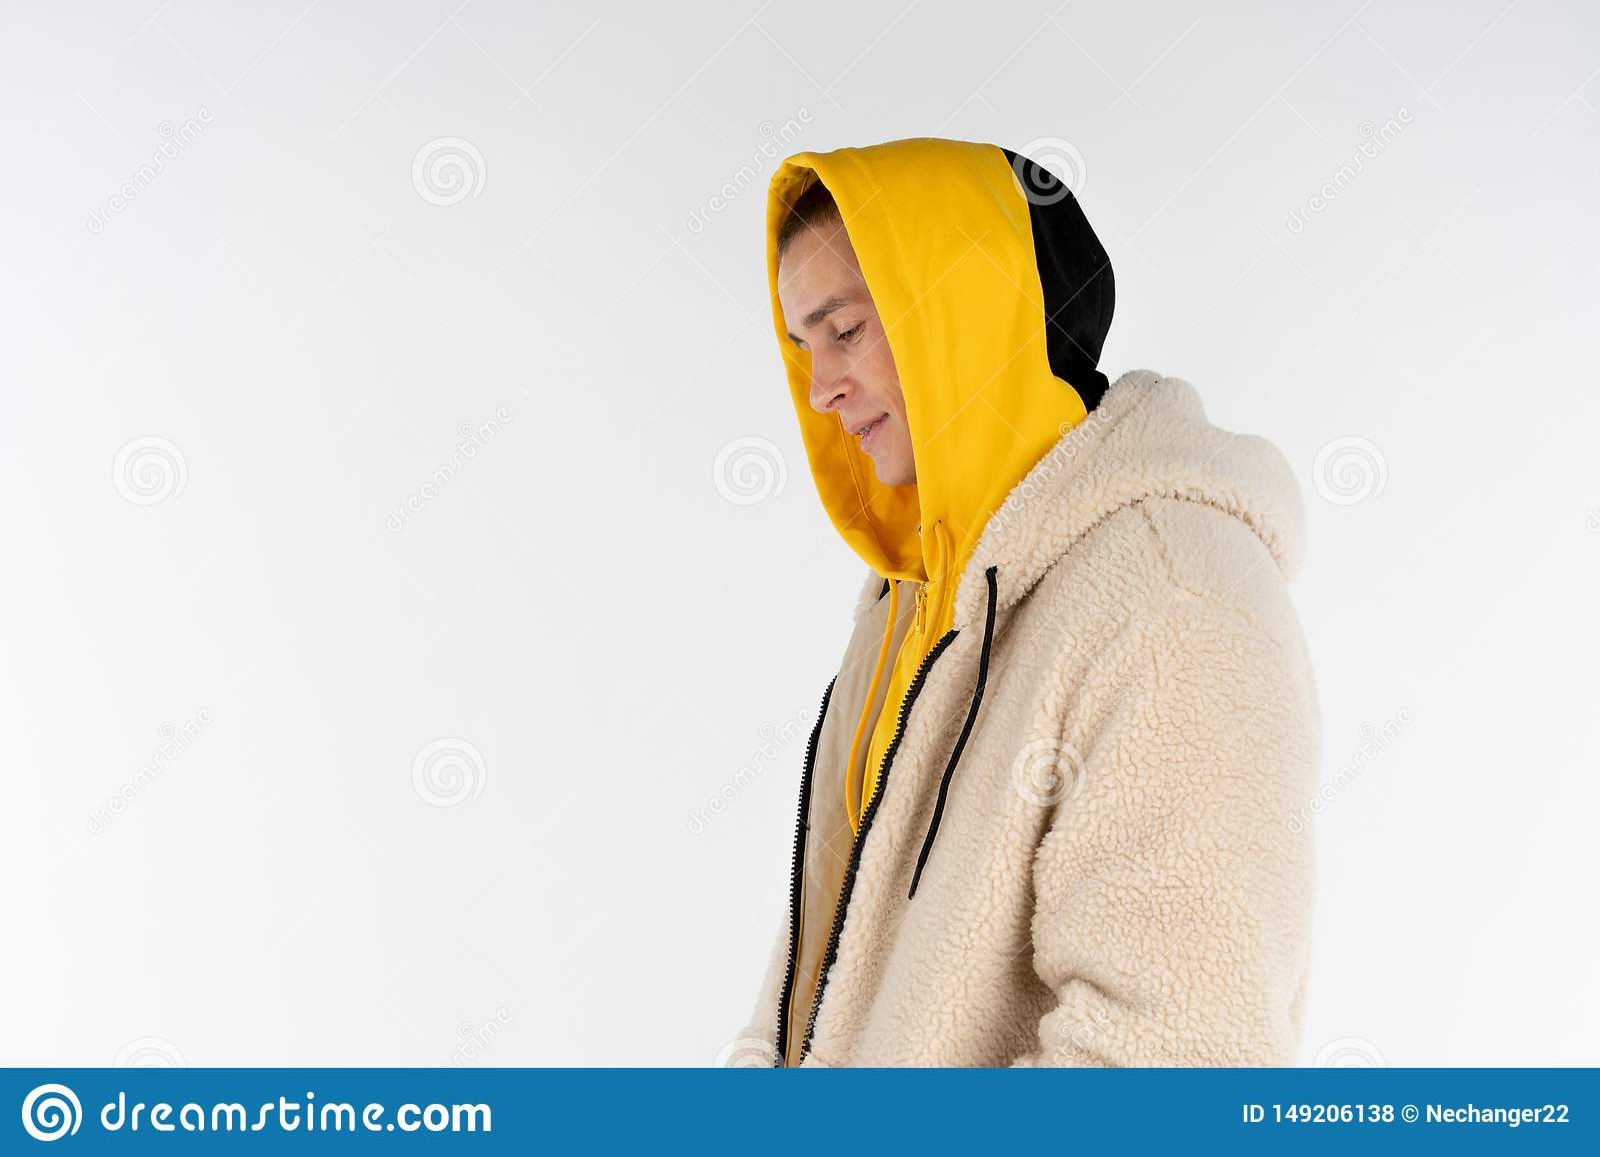 Halv l?ngdst?ende av den unga upprivna olyckliga mannen som b?r gult hoodieanseende mot vit bakgrund, copyspace f?r